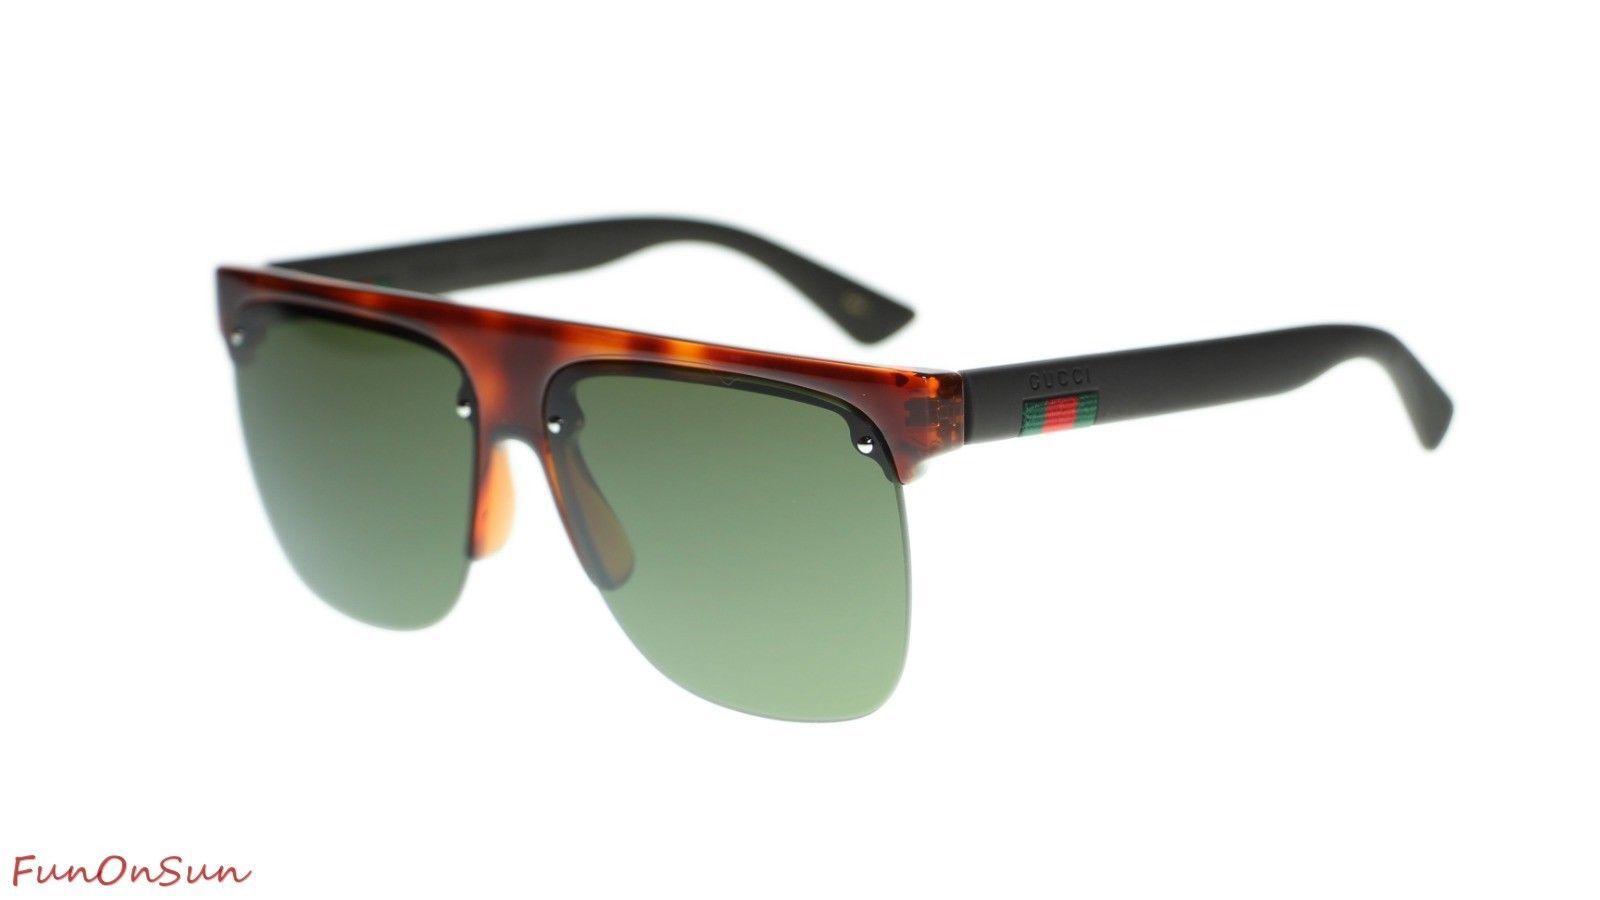 49ef26defb NEW Gucci Men Sunglasses GG0171S 003 Havana and 42 similar items. 10